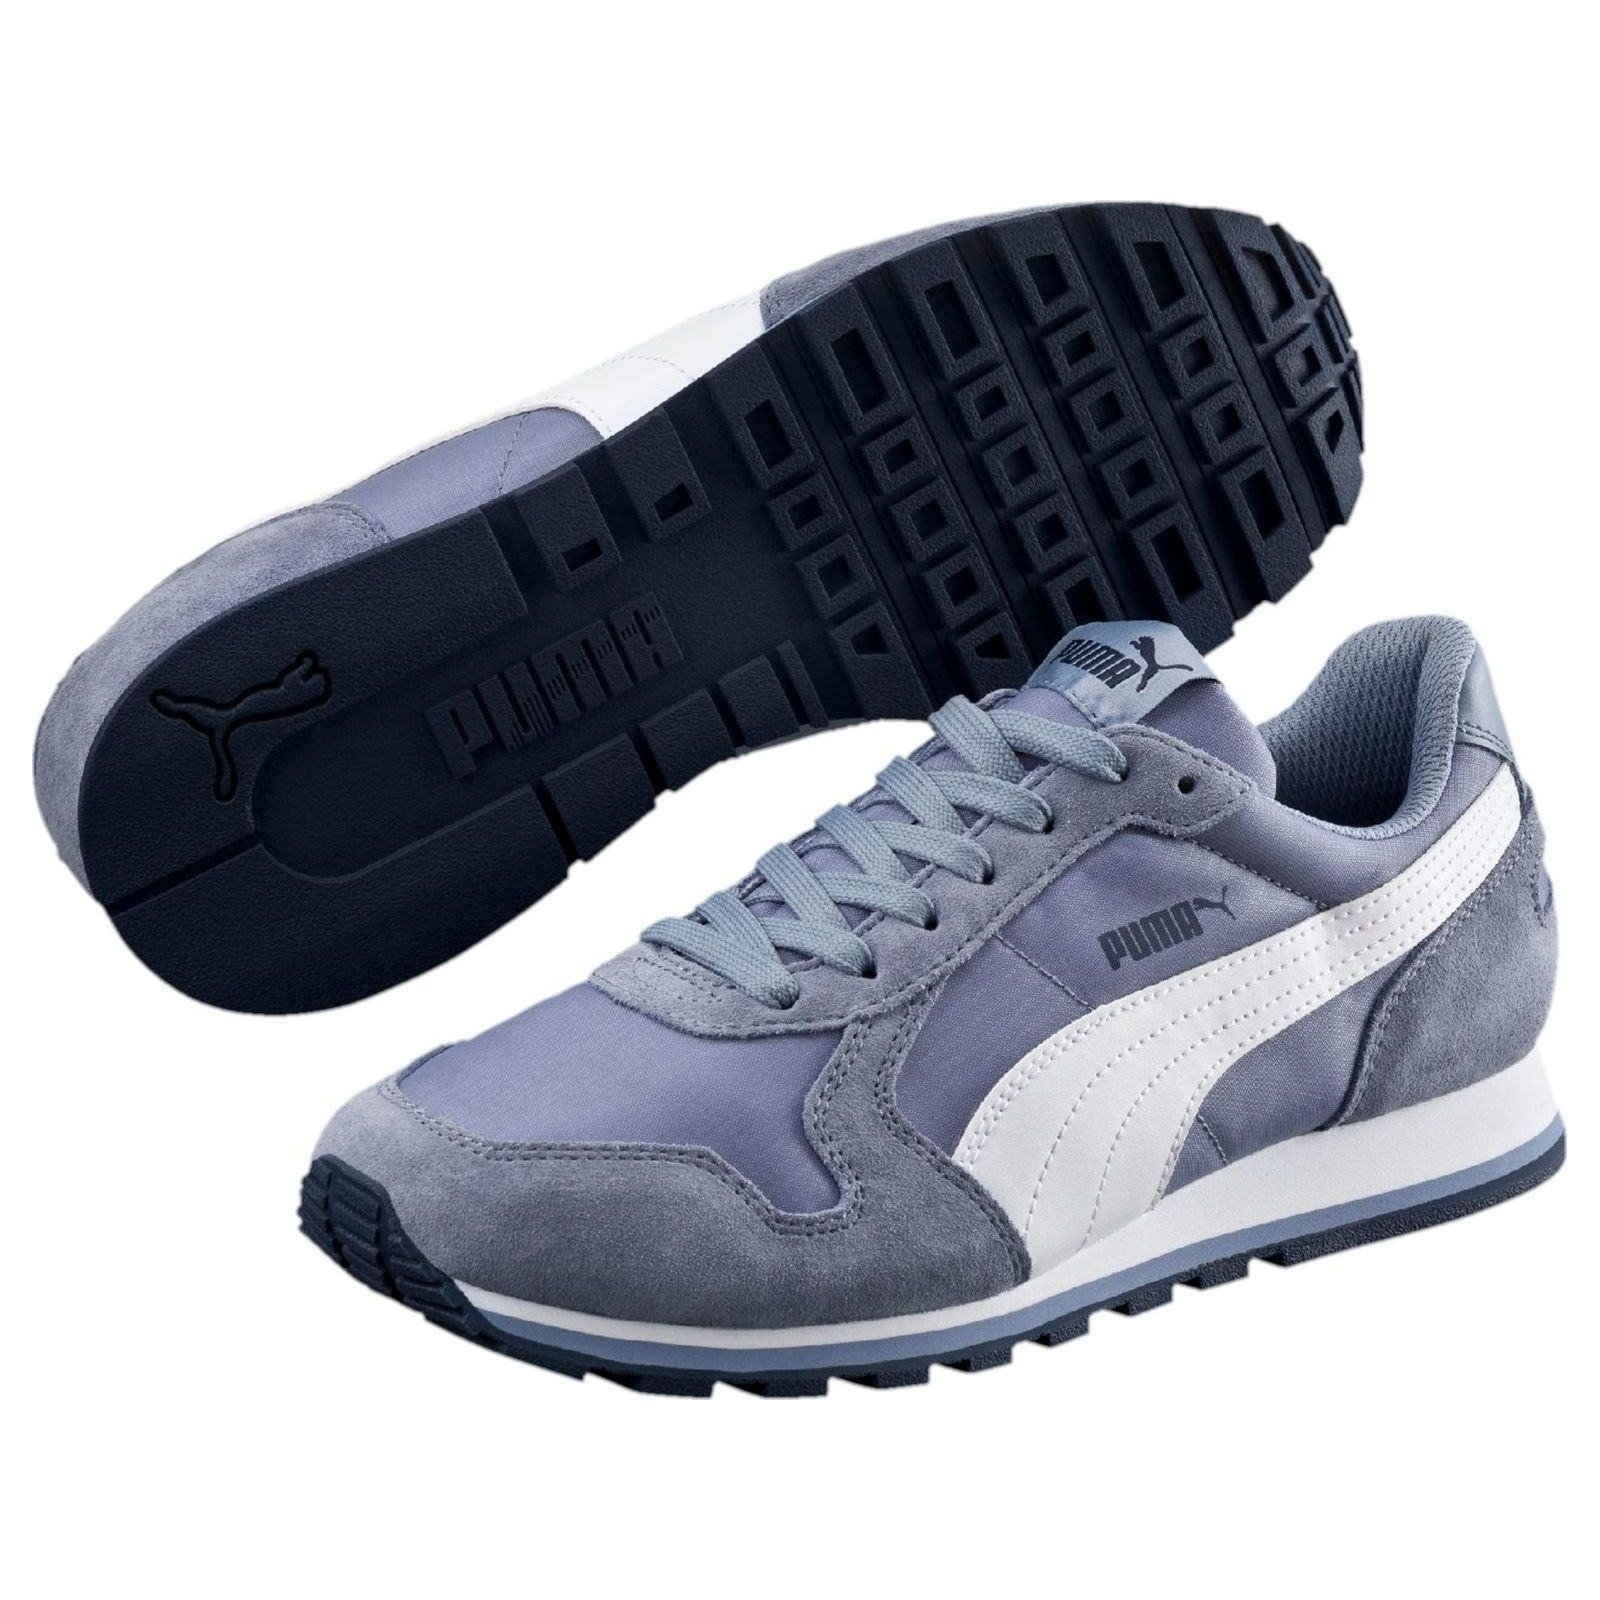 Buty Damskie Puma St Runner 356738 32 36 42 38 6792026629 Oficjalne Archiwum Allegro Puma Puma Sneaker Shoes